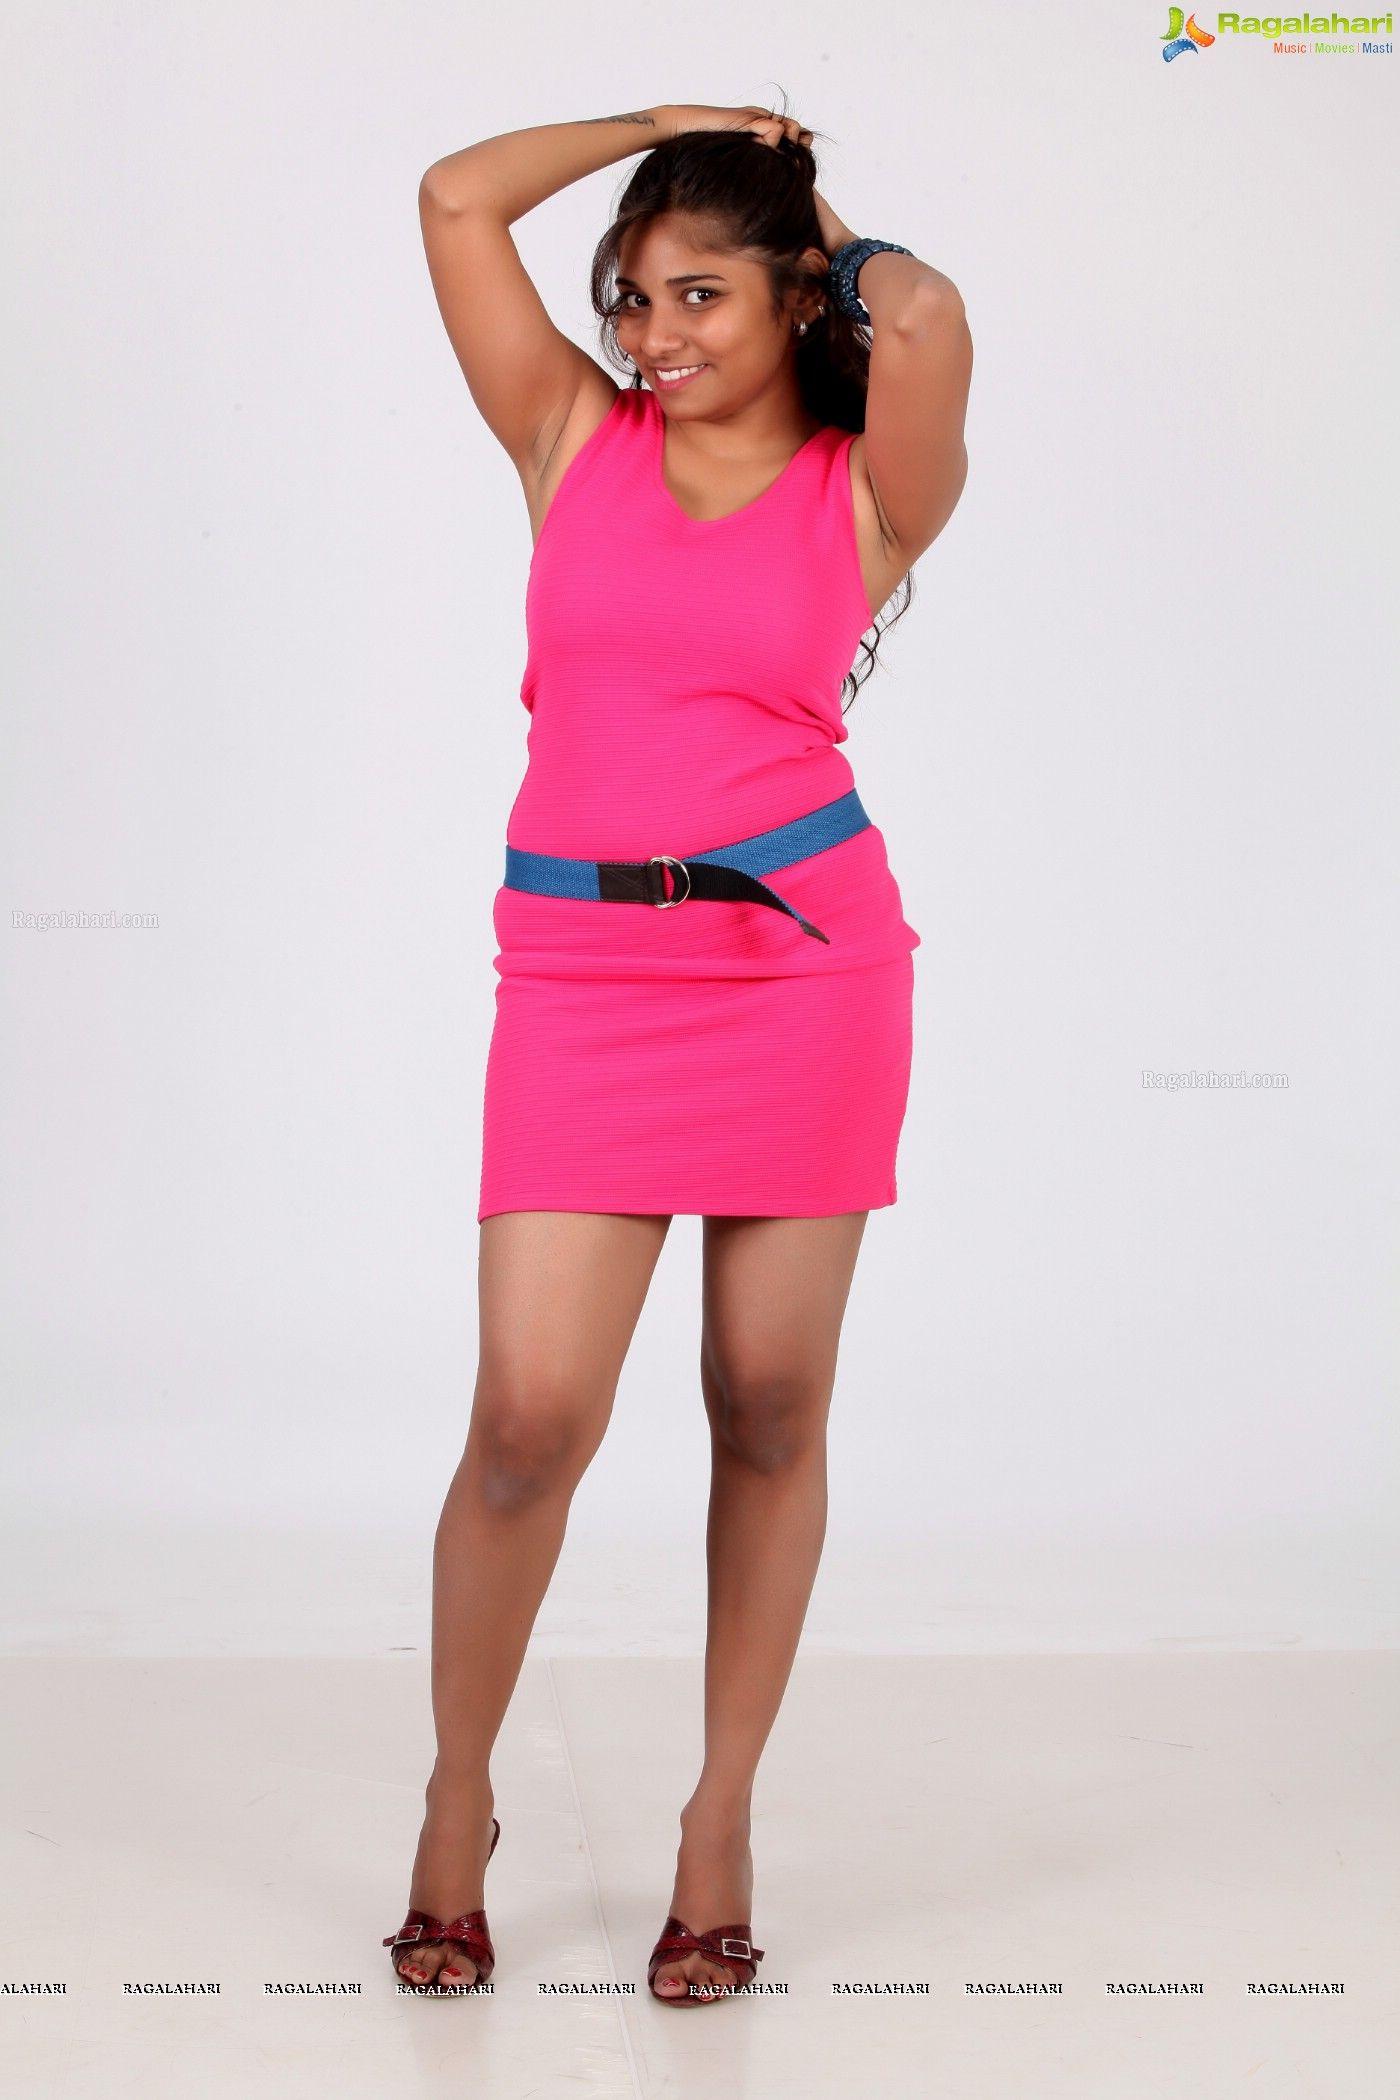 Madhu Shalini Hot Sex Stunning telugu model madhuri in pink dress - ragalahari exclusive photo